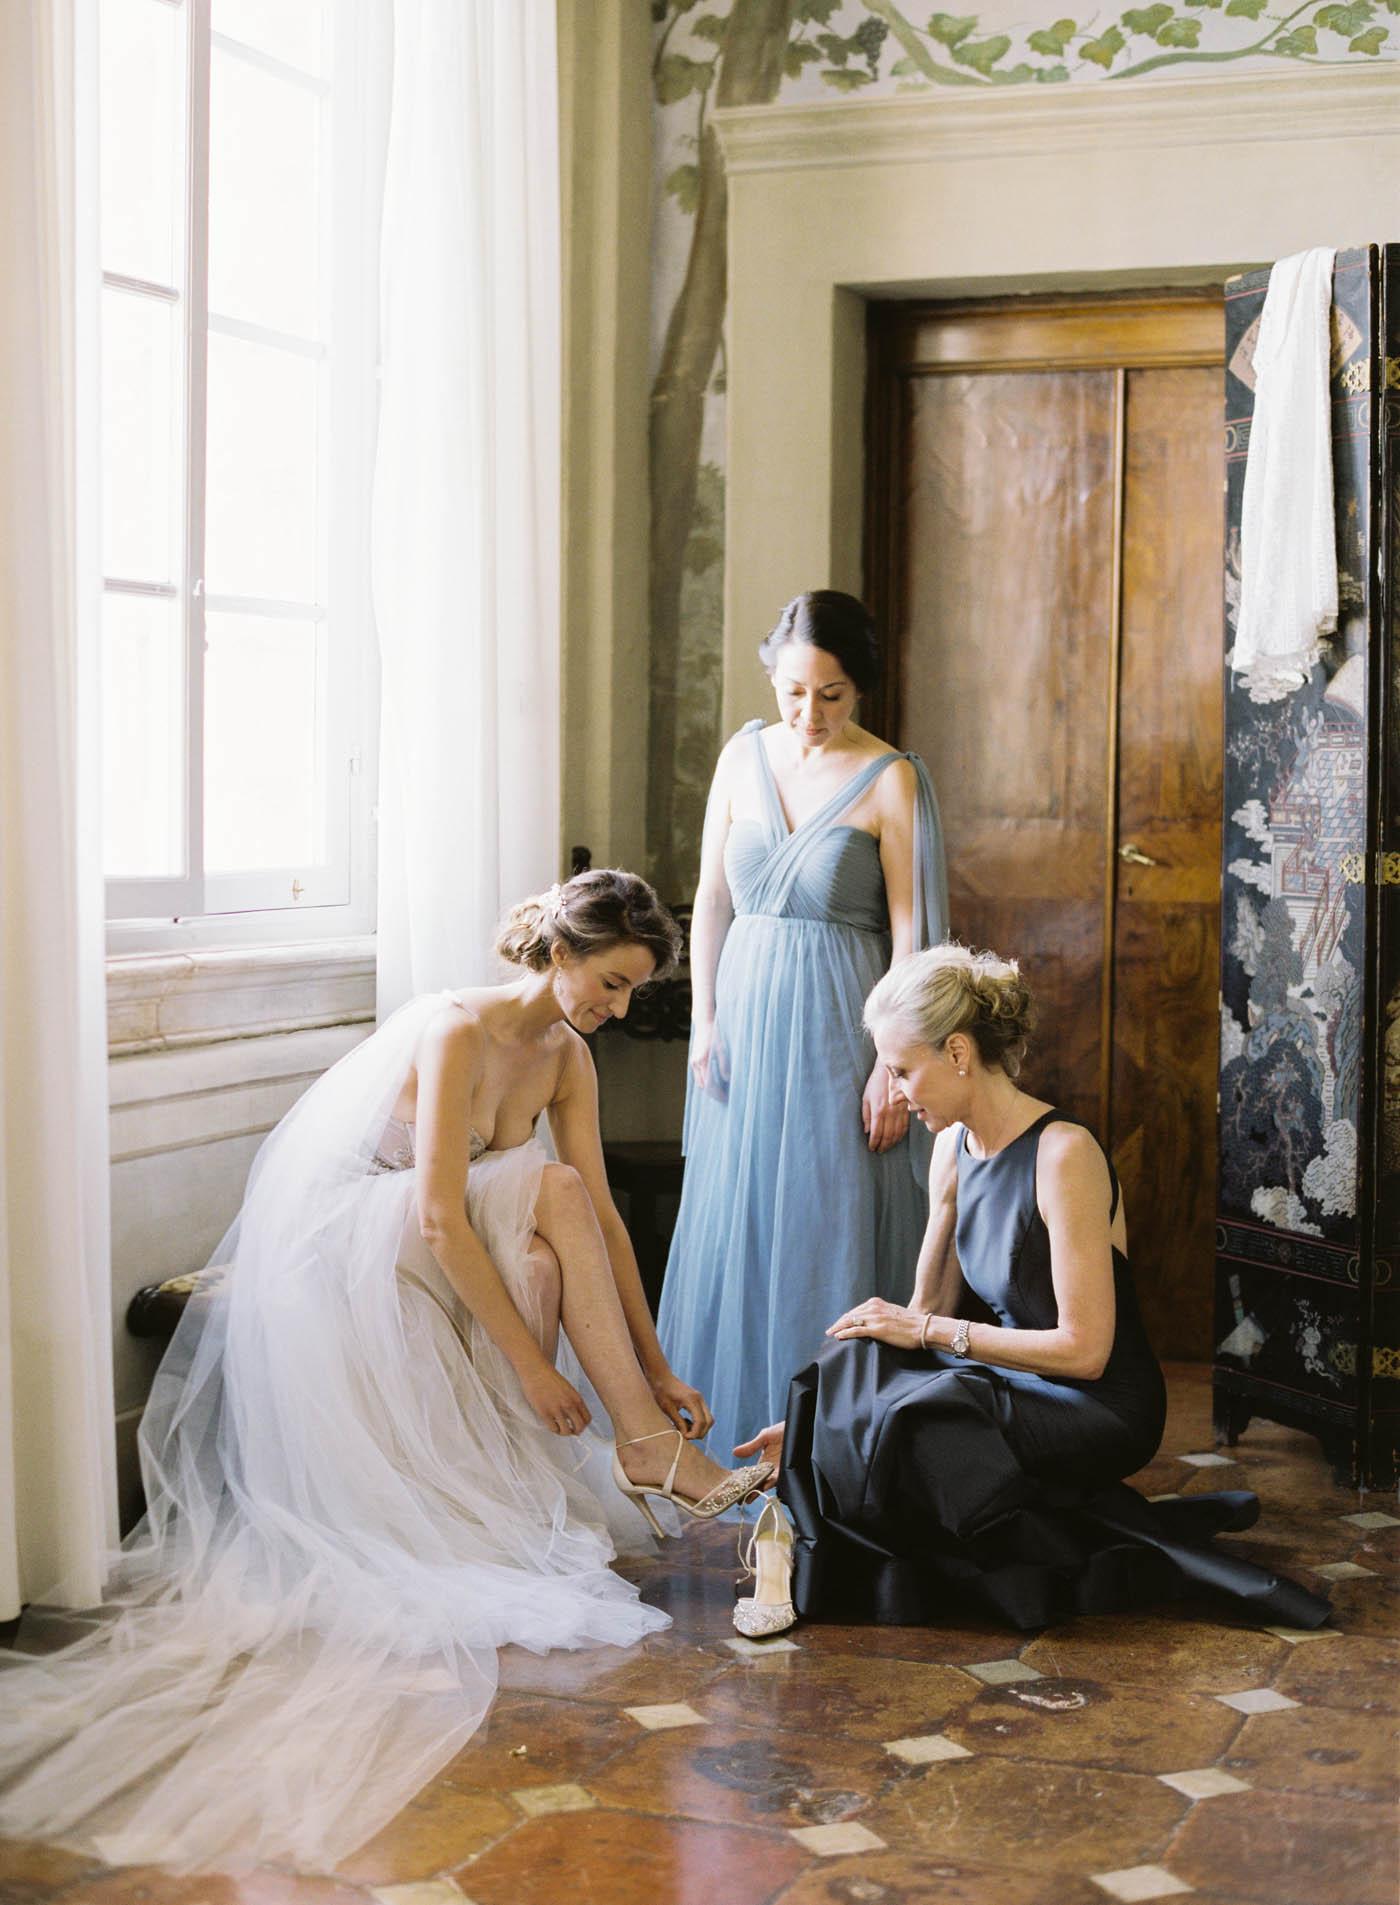 Villa_Cetinale_Wedding-12-Jen_Huang-ElanJacob-135-Jen_Huang-007307-R1-005.jpg